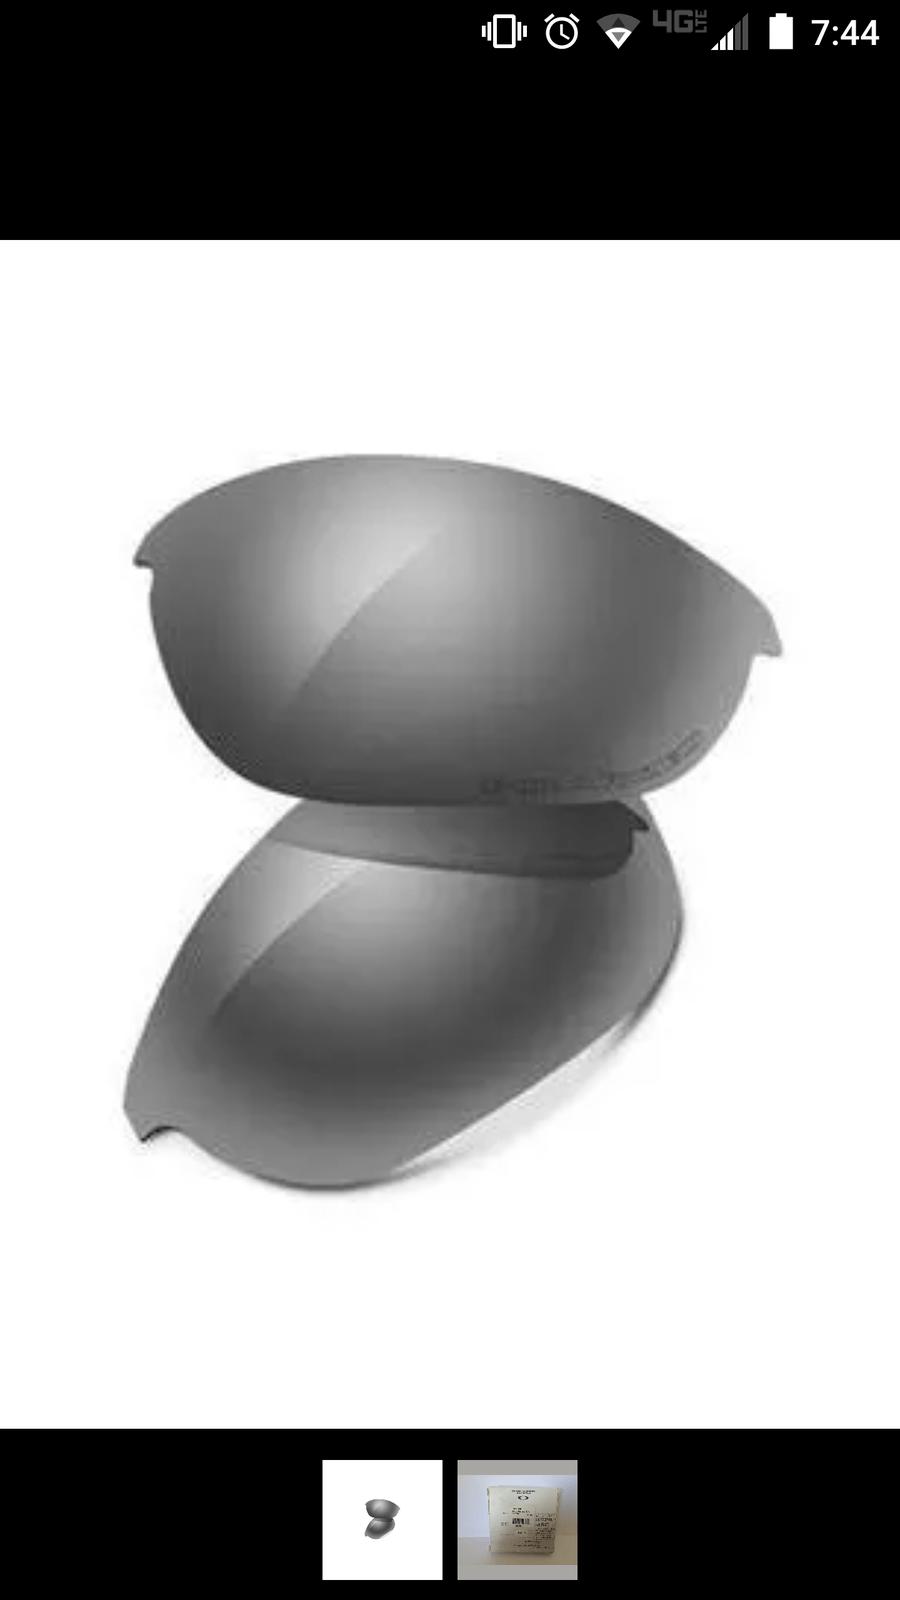 Original Half Jacket Black Iridium Polarized Replacement Lenses $65 BNIB - Screenshot_2015-12-13-19-44-57.png